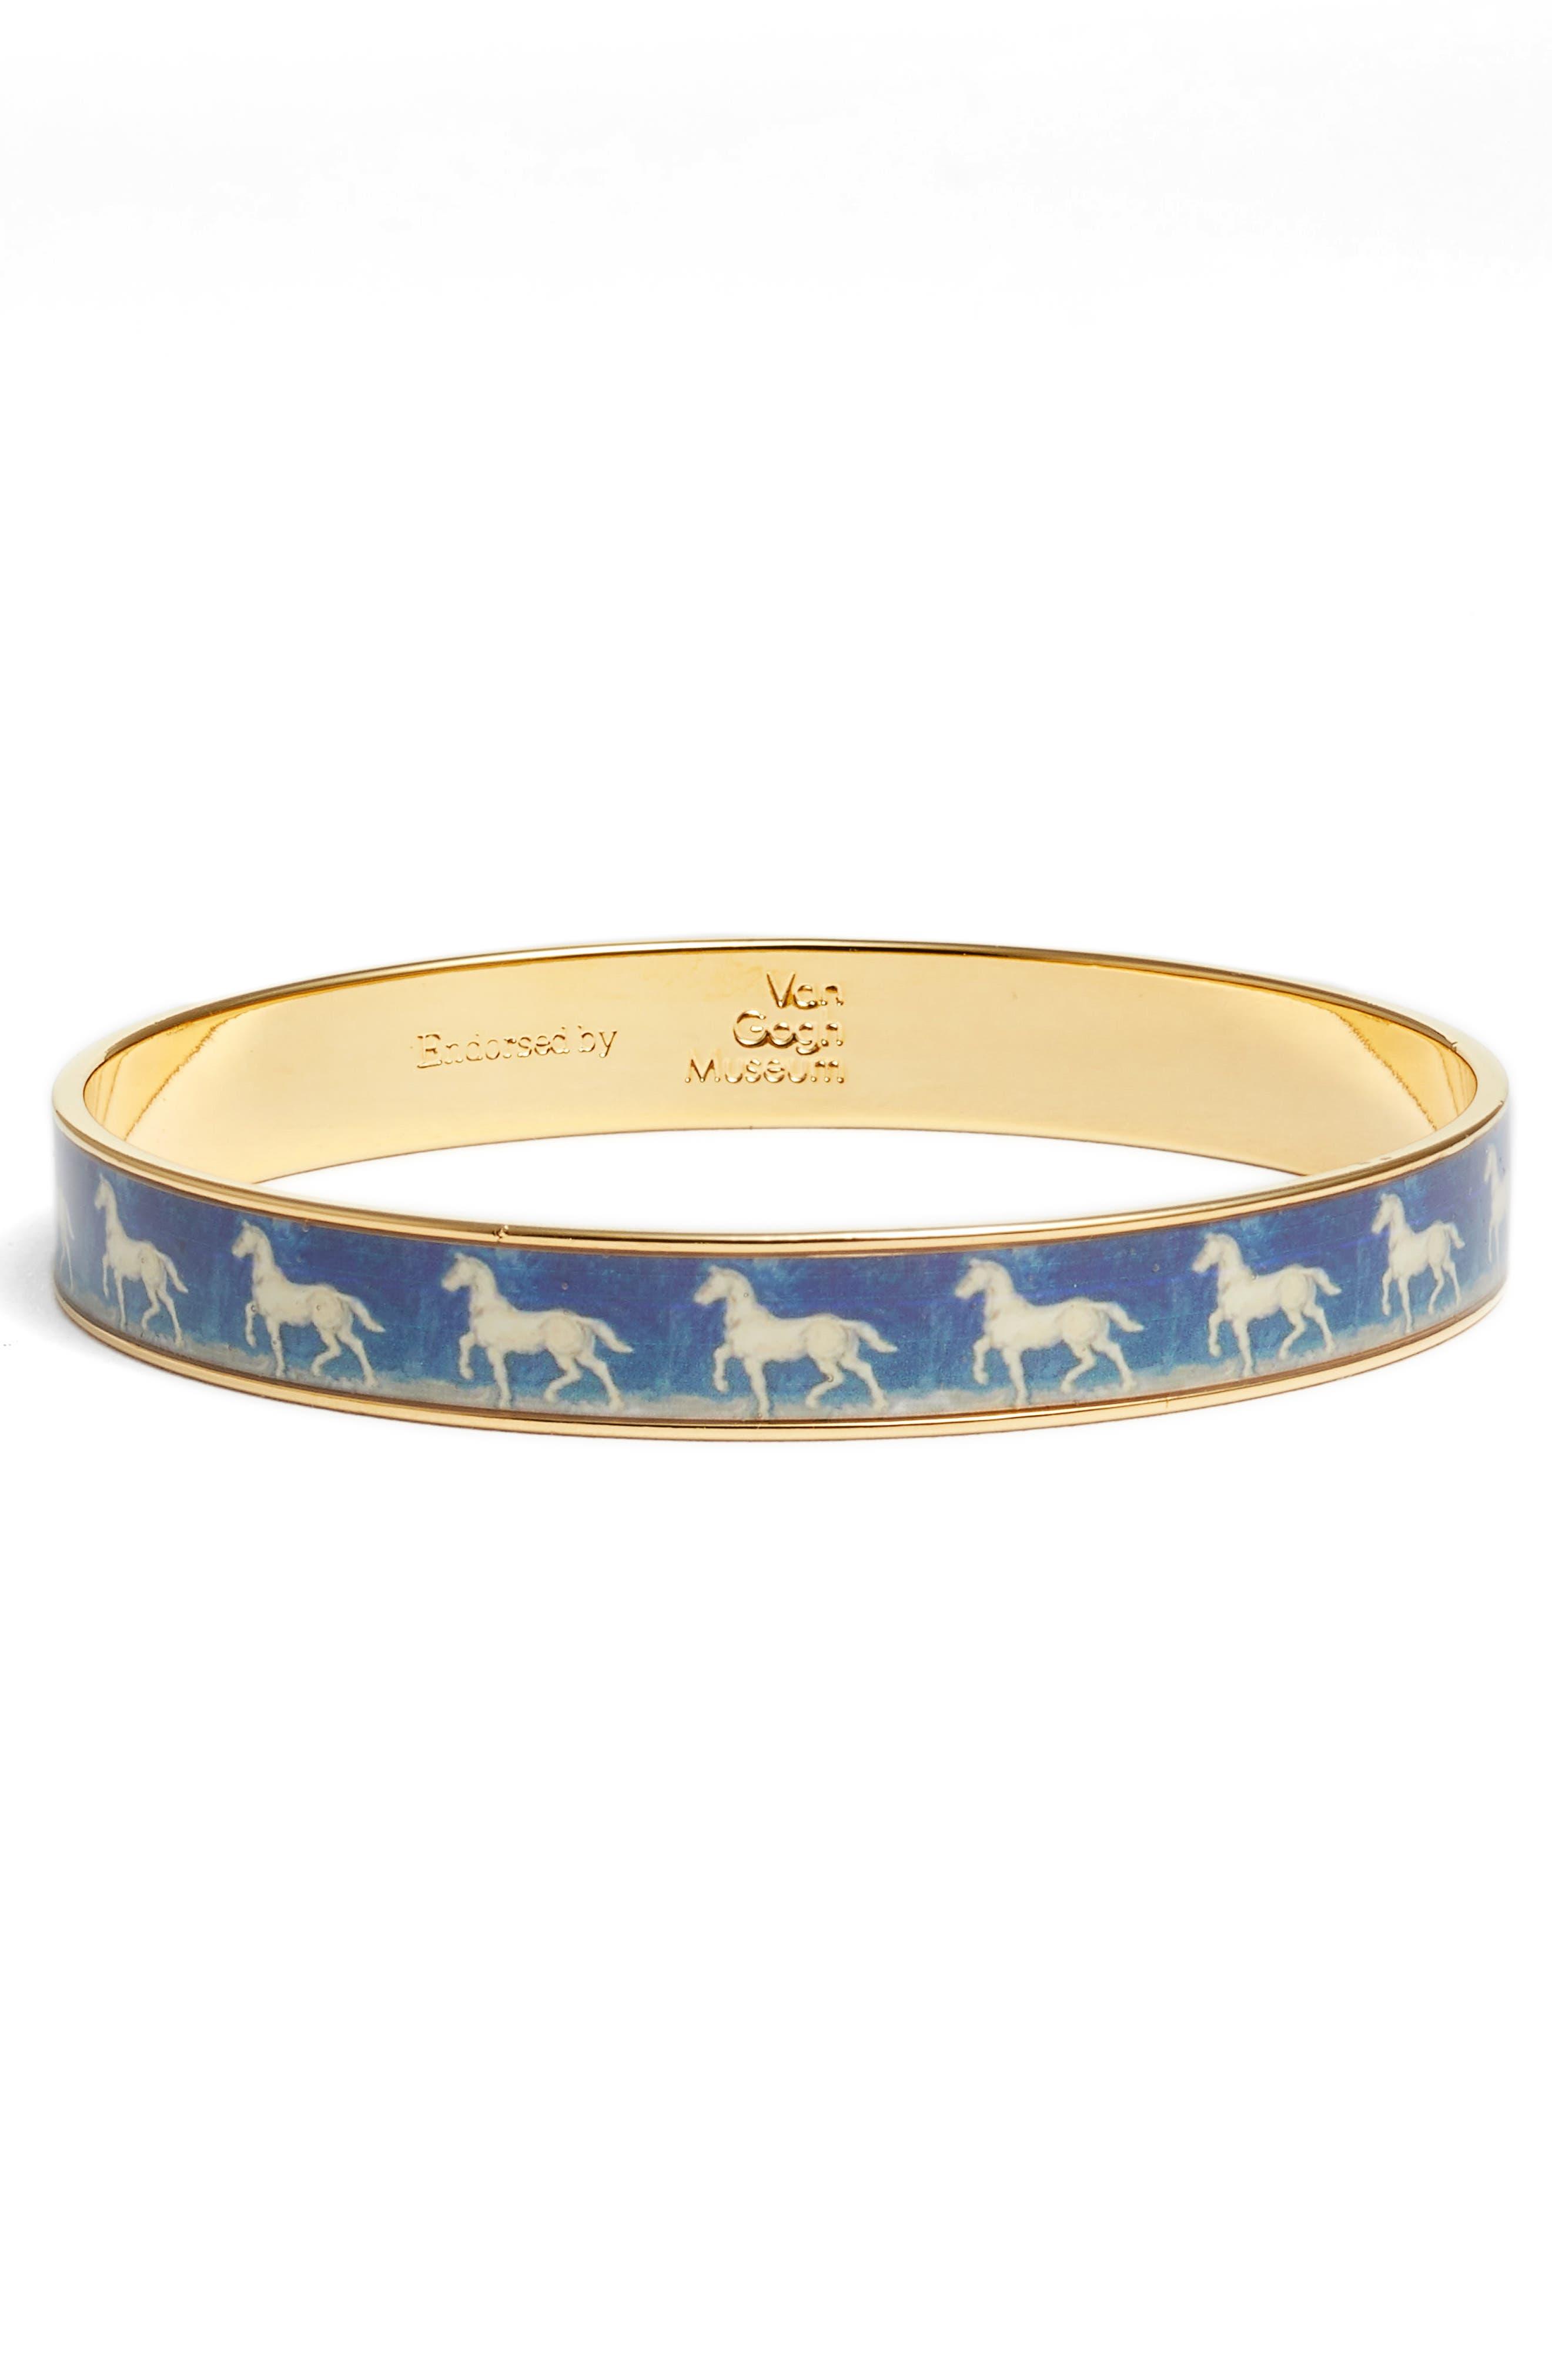 Blue Horse Medium Bracelet,                             Main thumbnail 1, color,                             Blue/ Gold